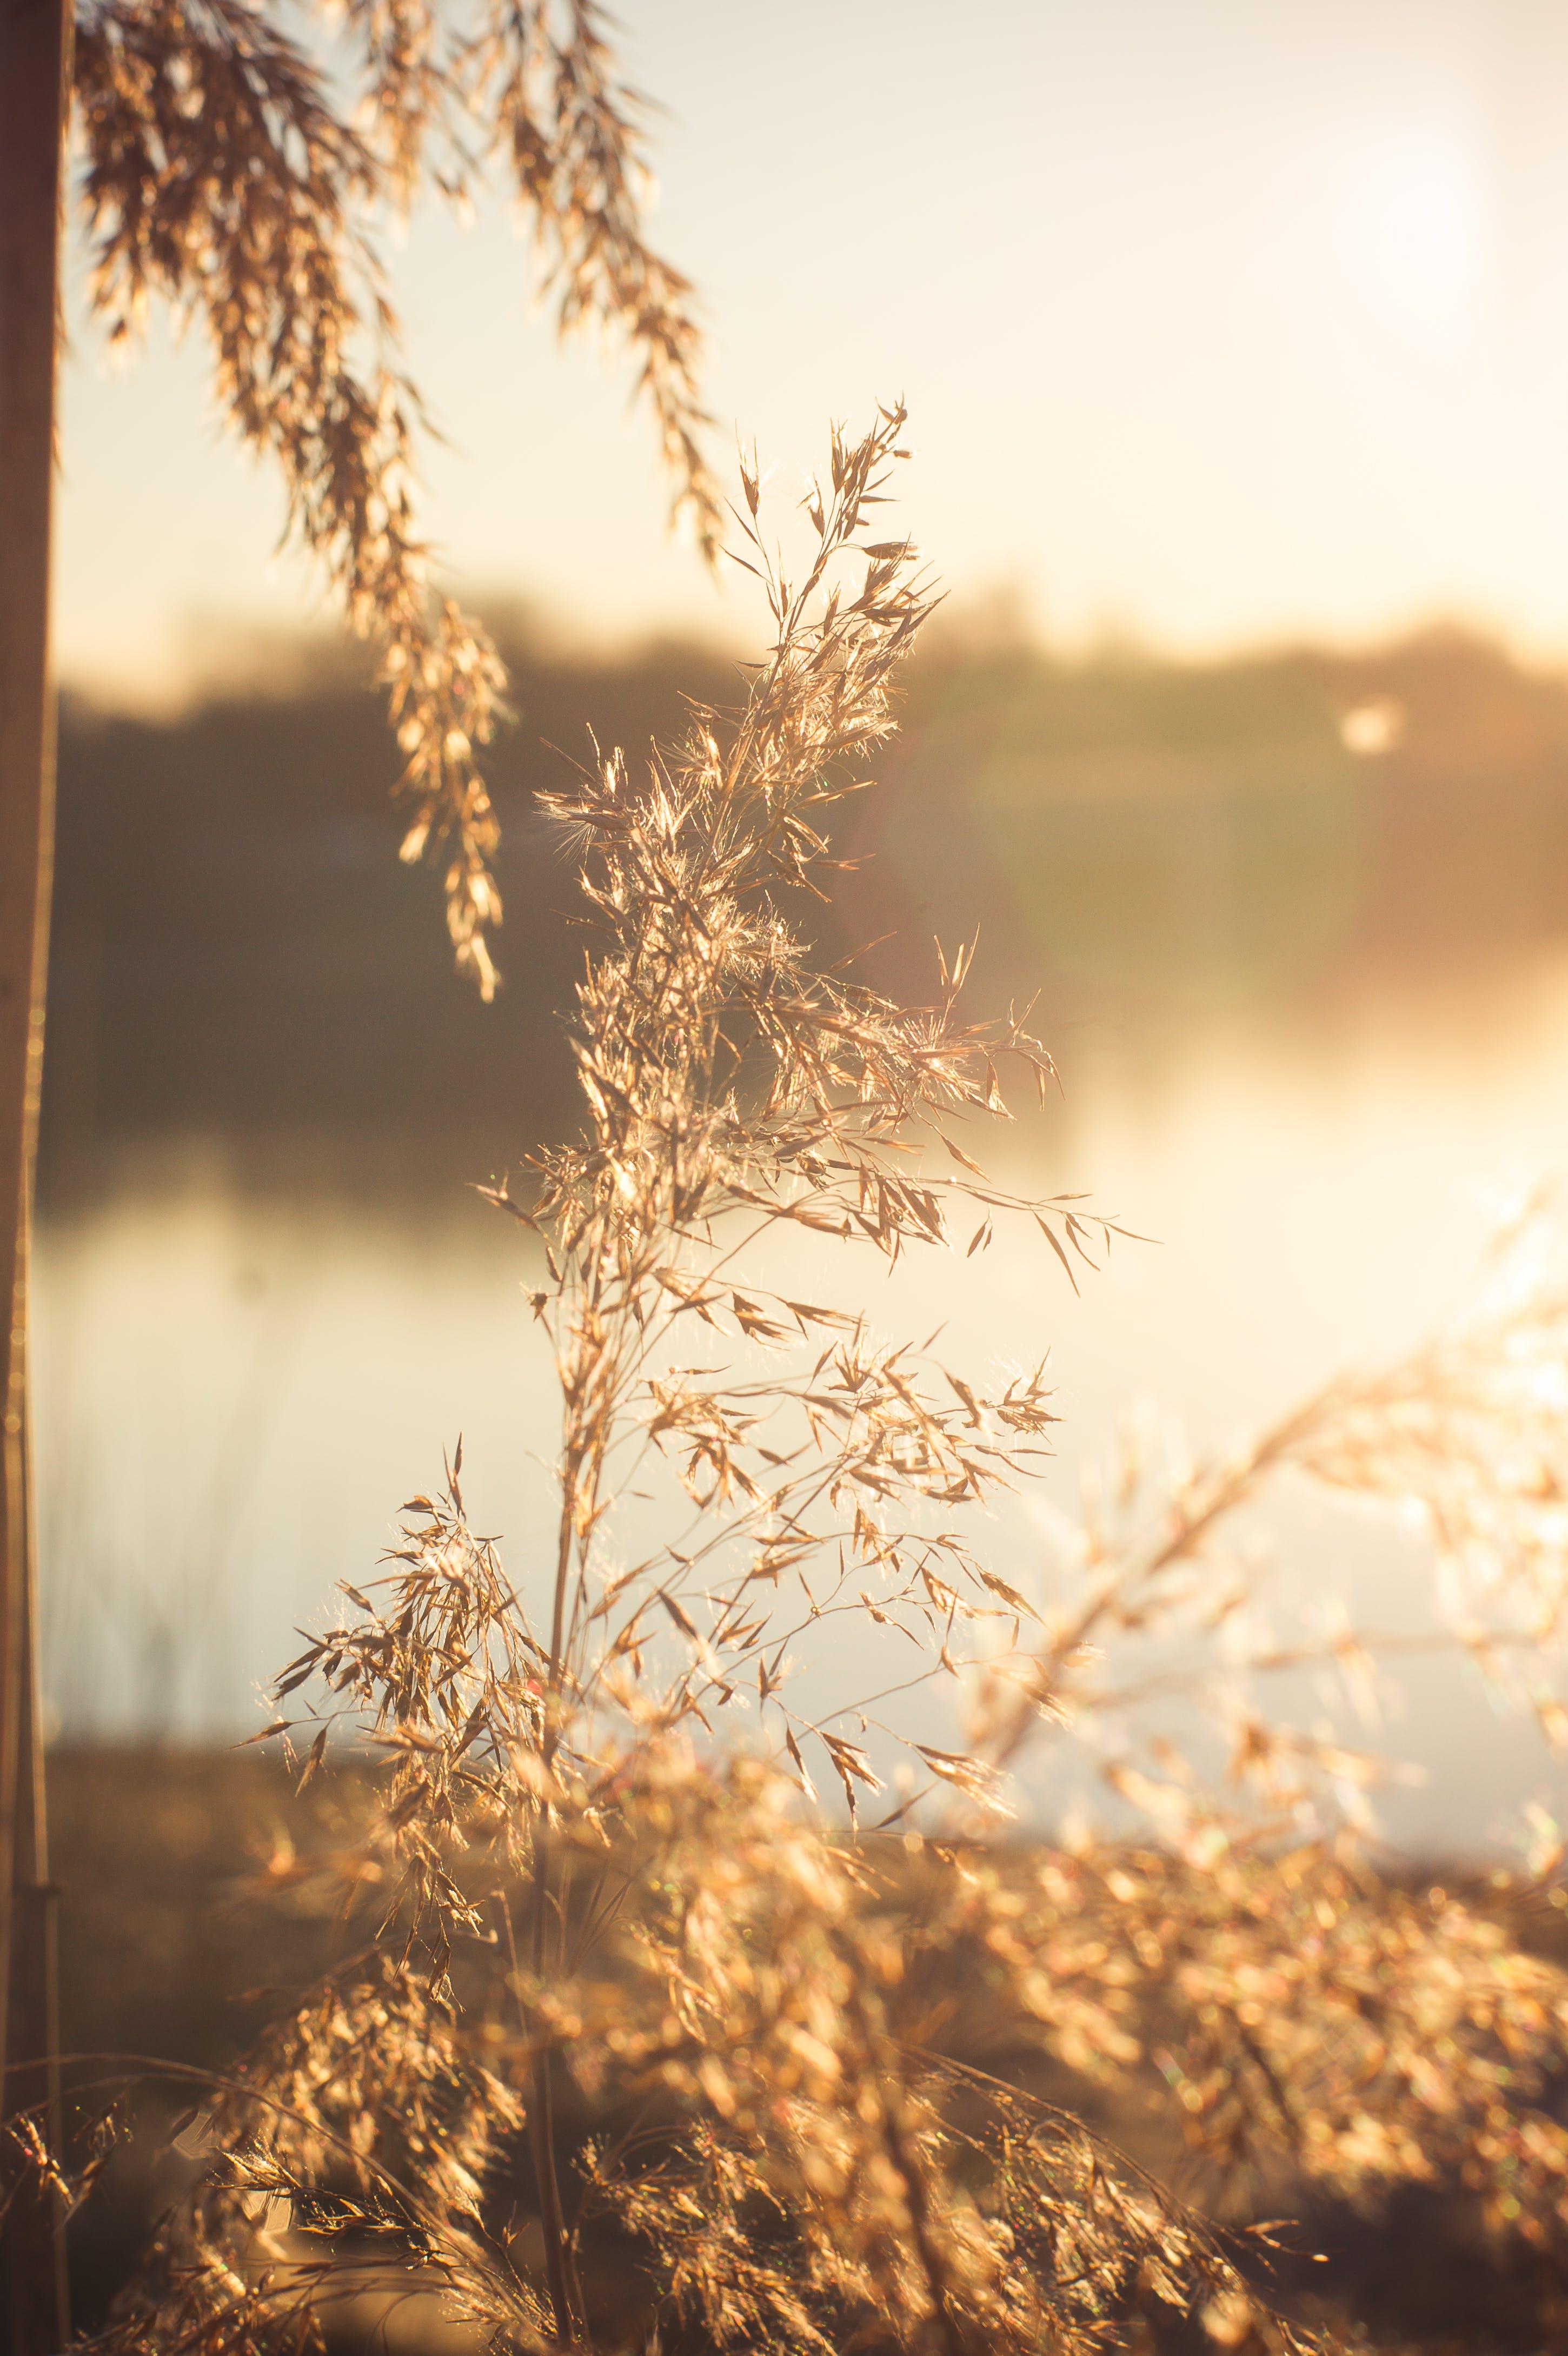 Free stock photo of Beautiful Sunsets, botany, environment, gold sky